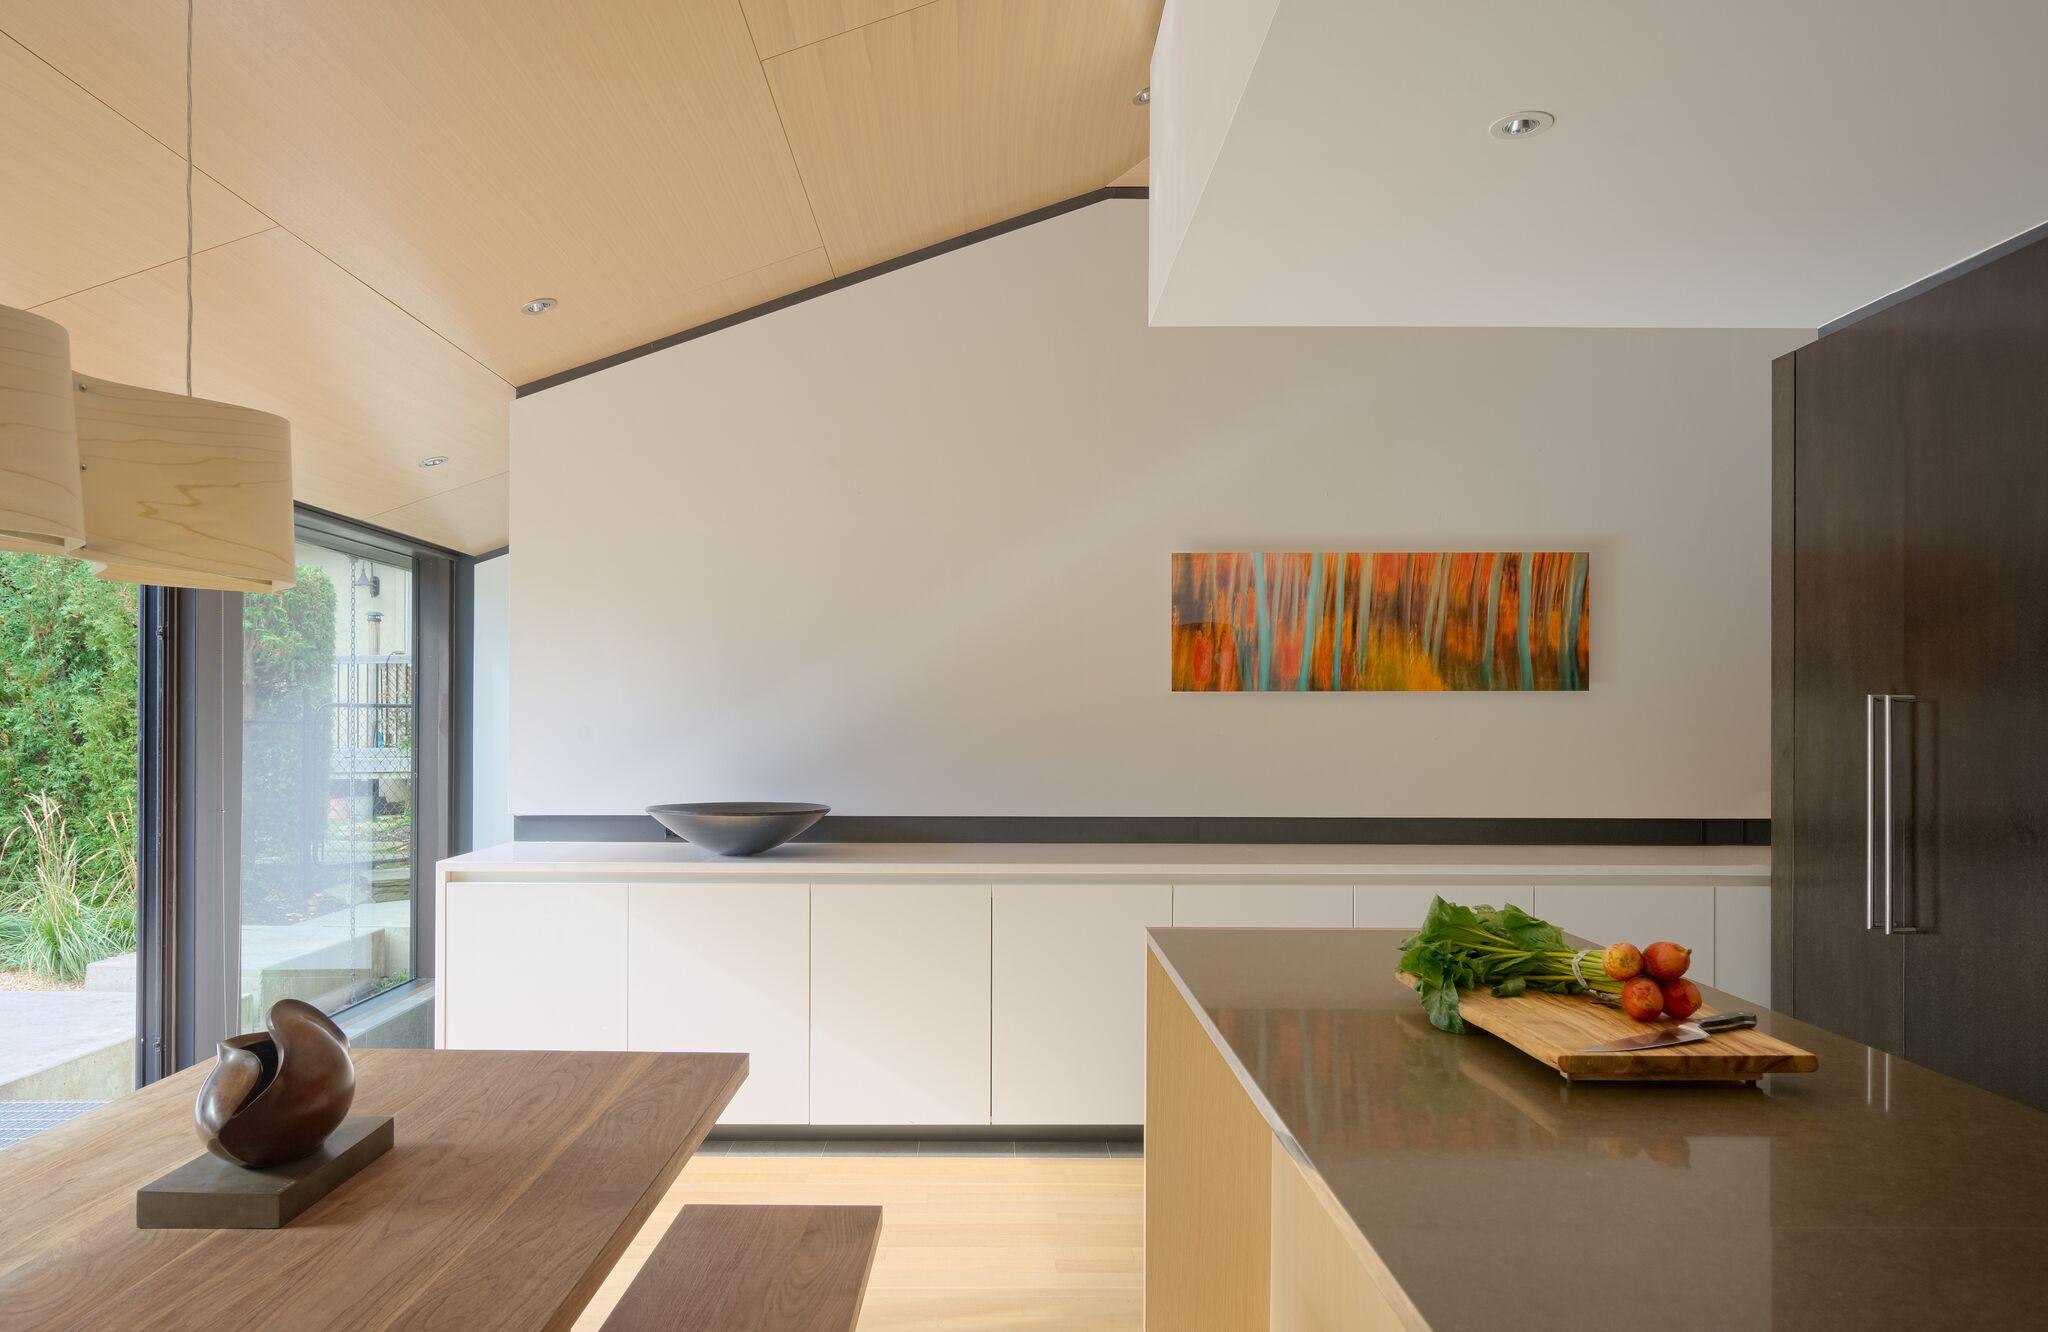 Abenbare House Interior Kitchen